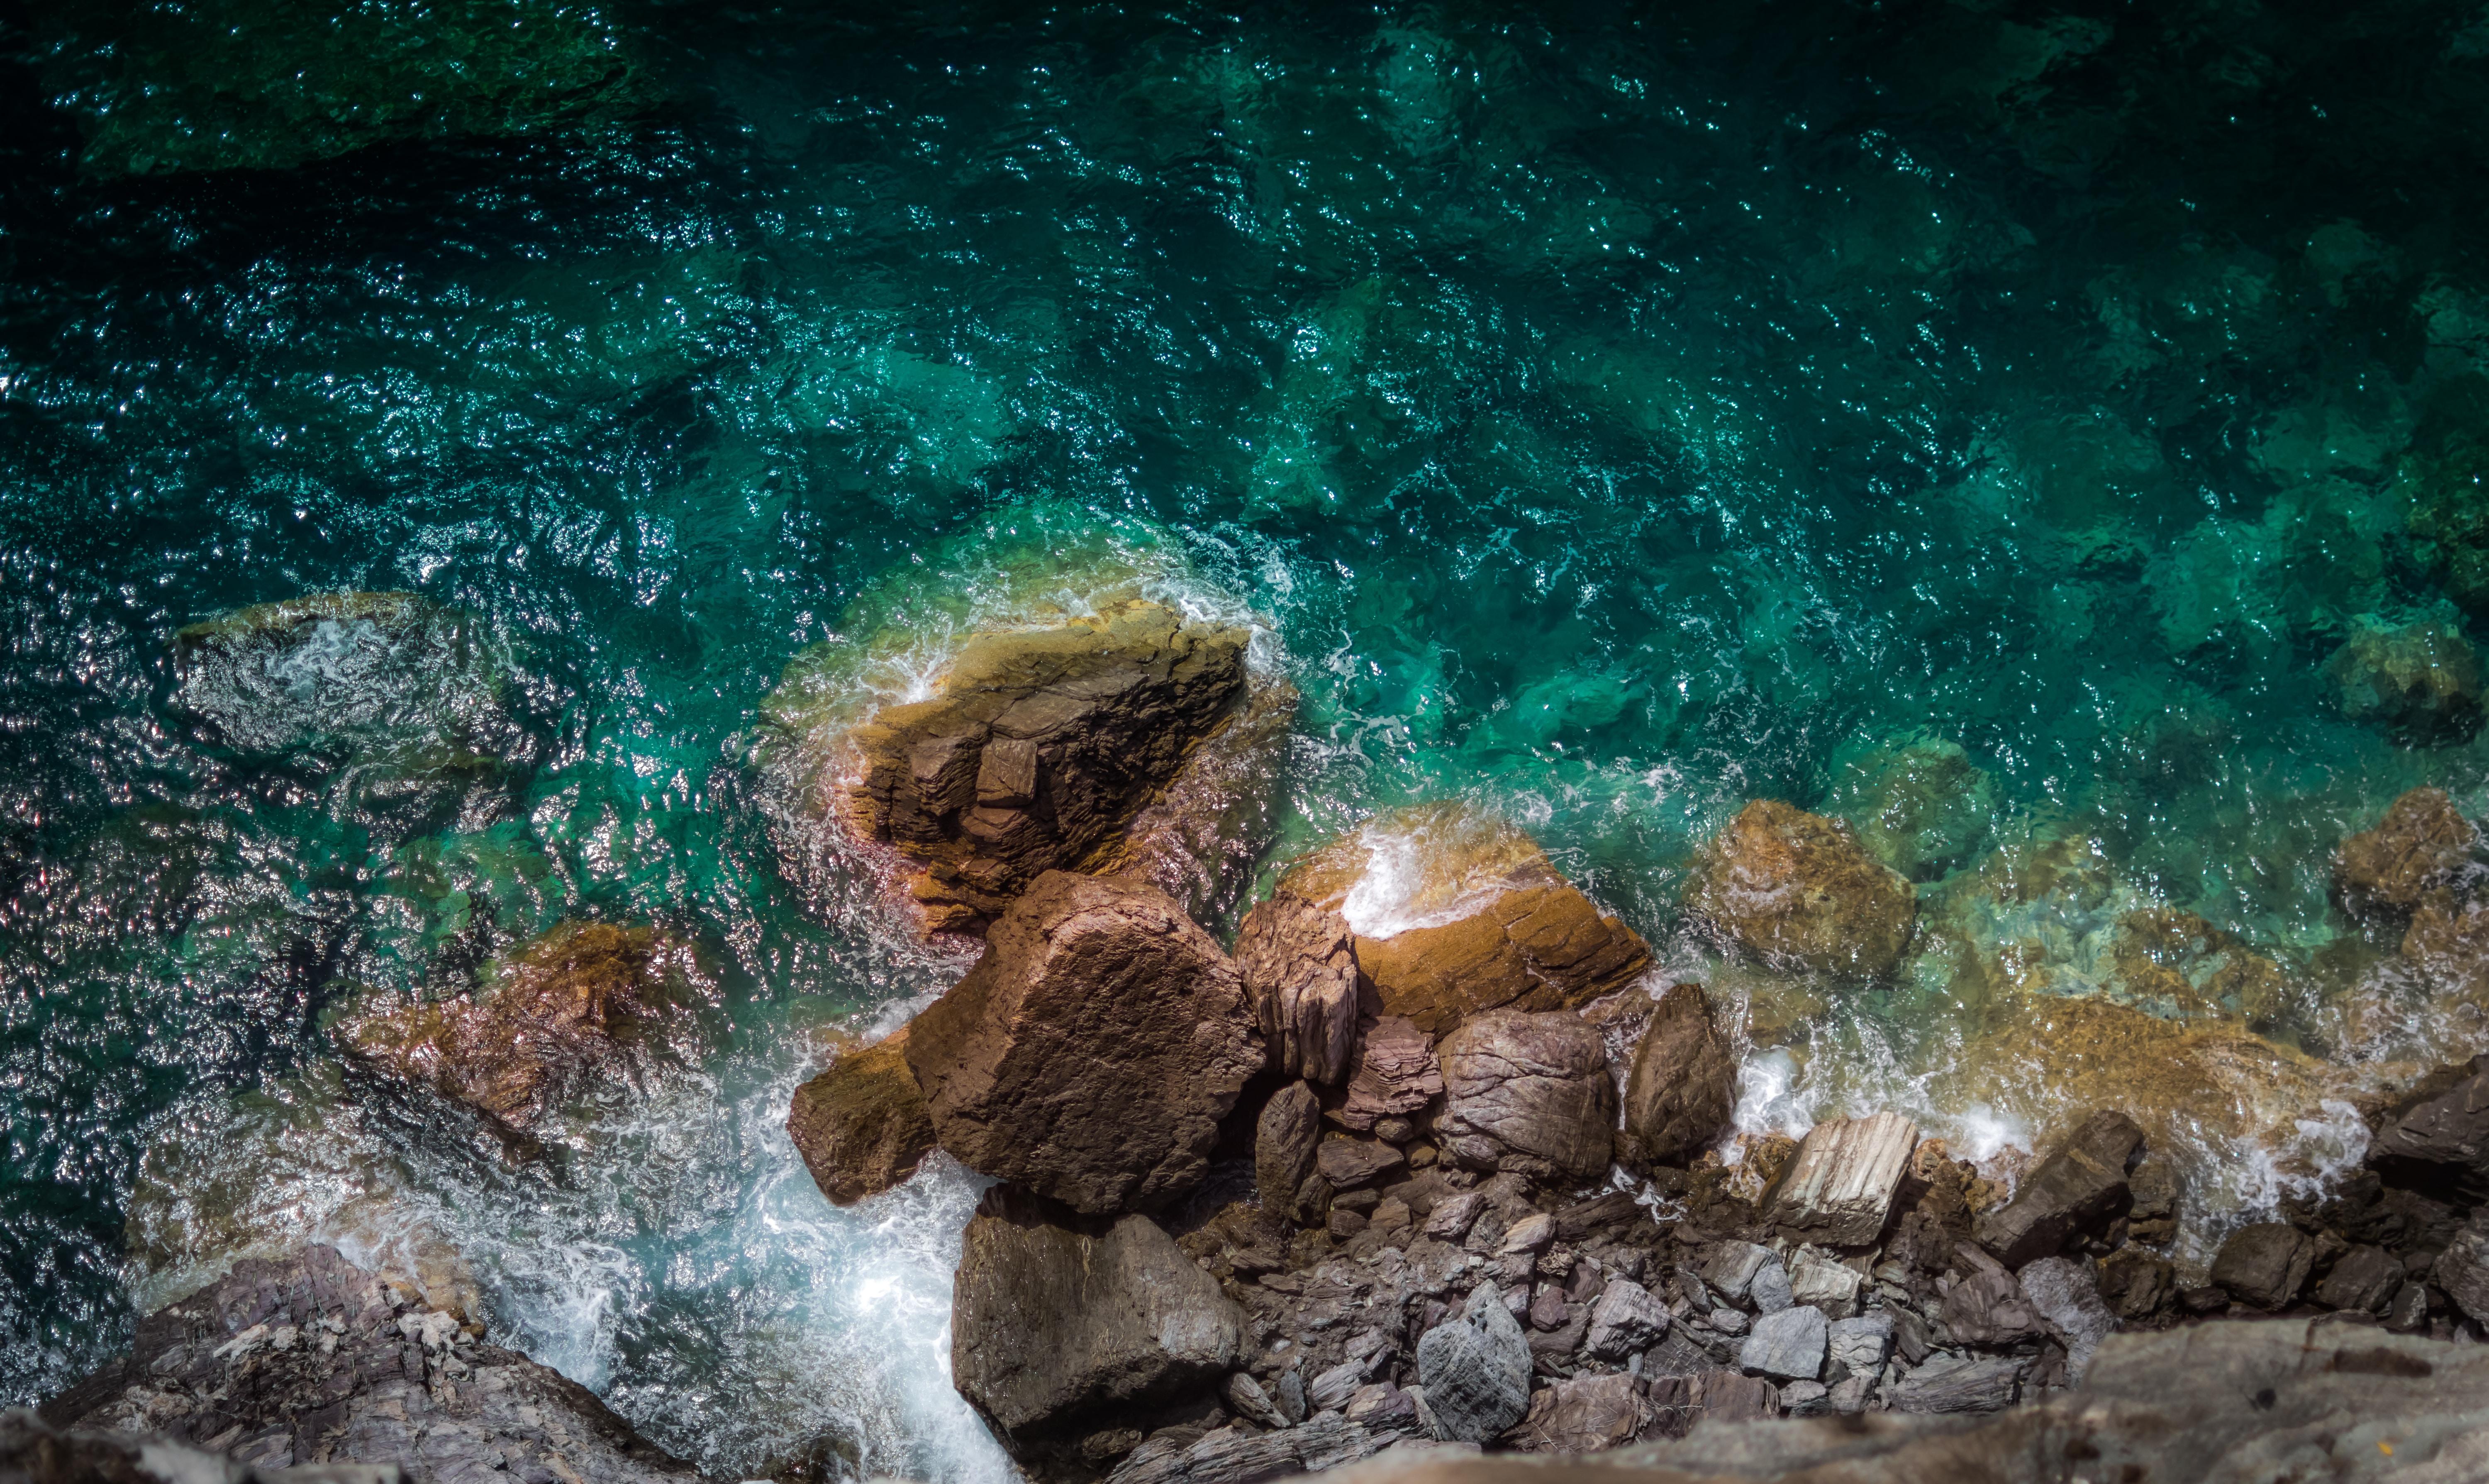 rocky shore near teal body of water